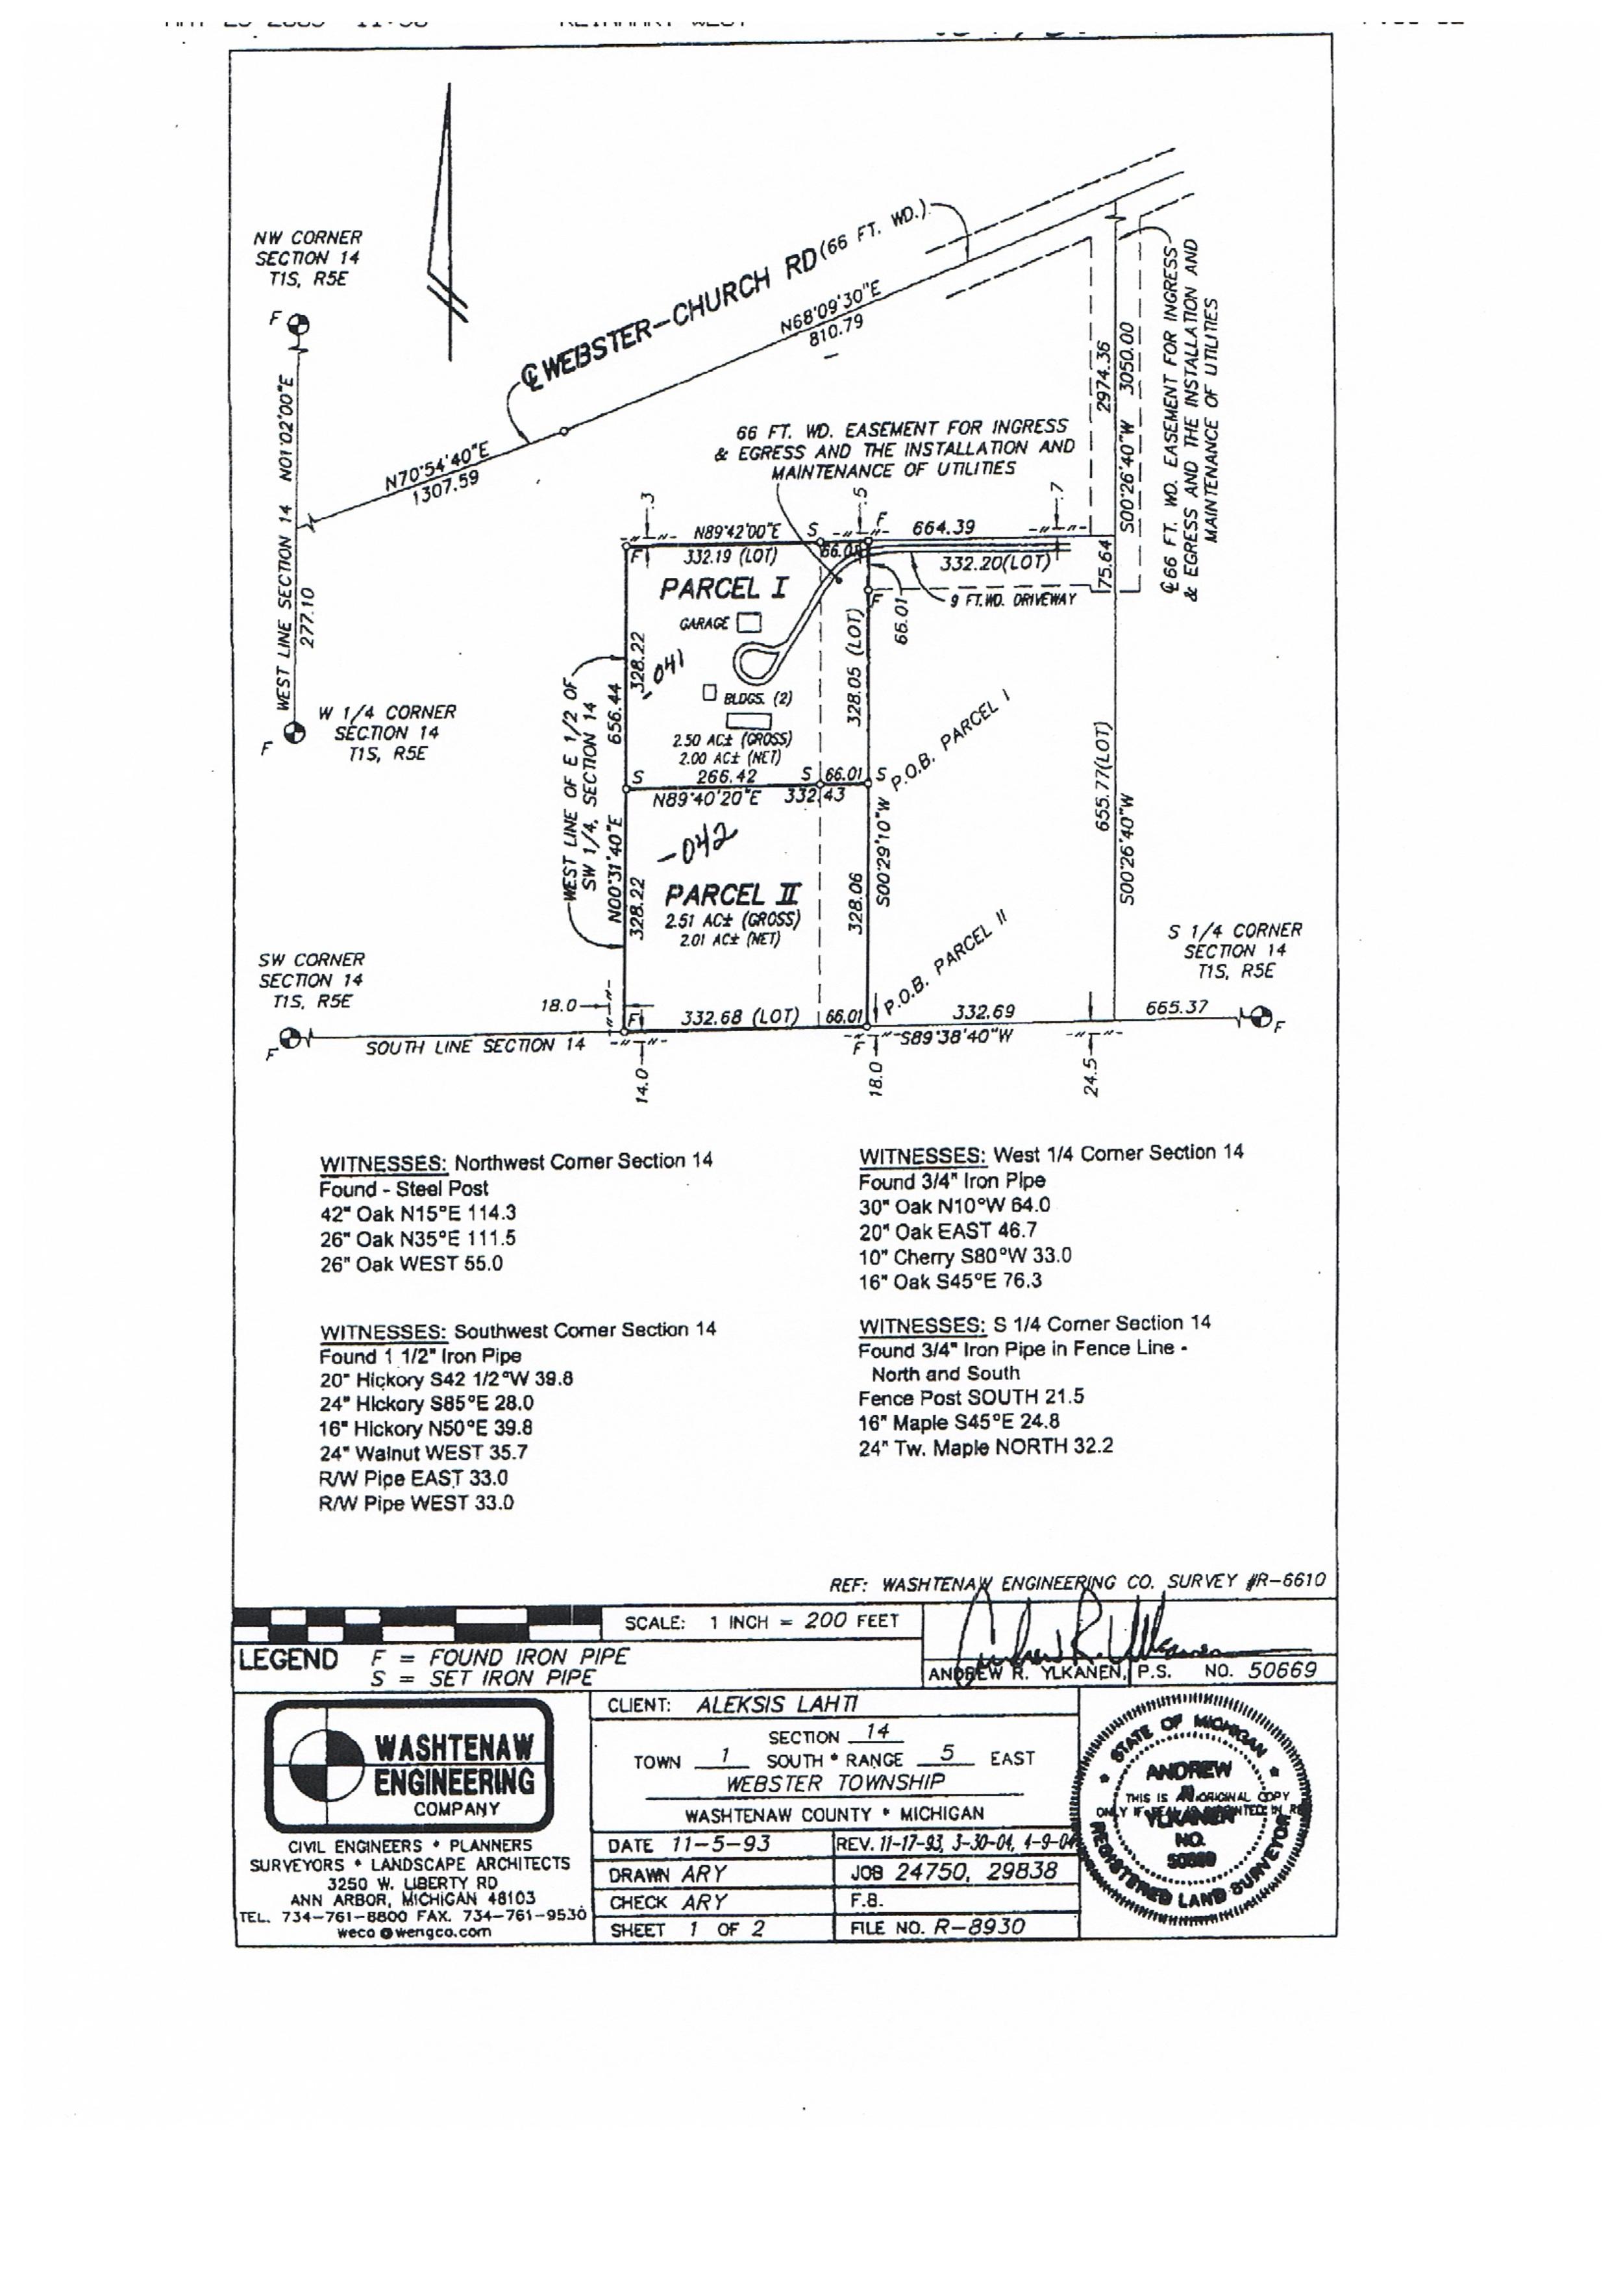 Annie Property Survey.jpg